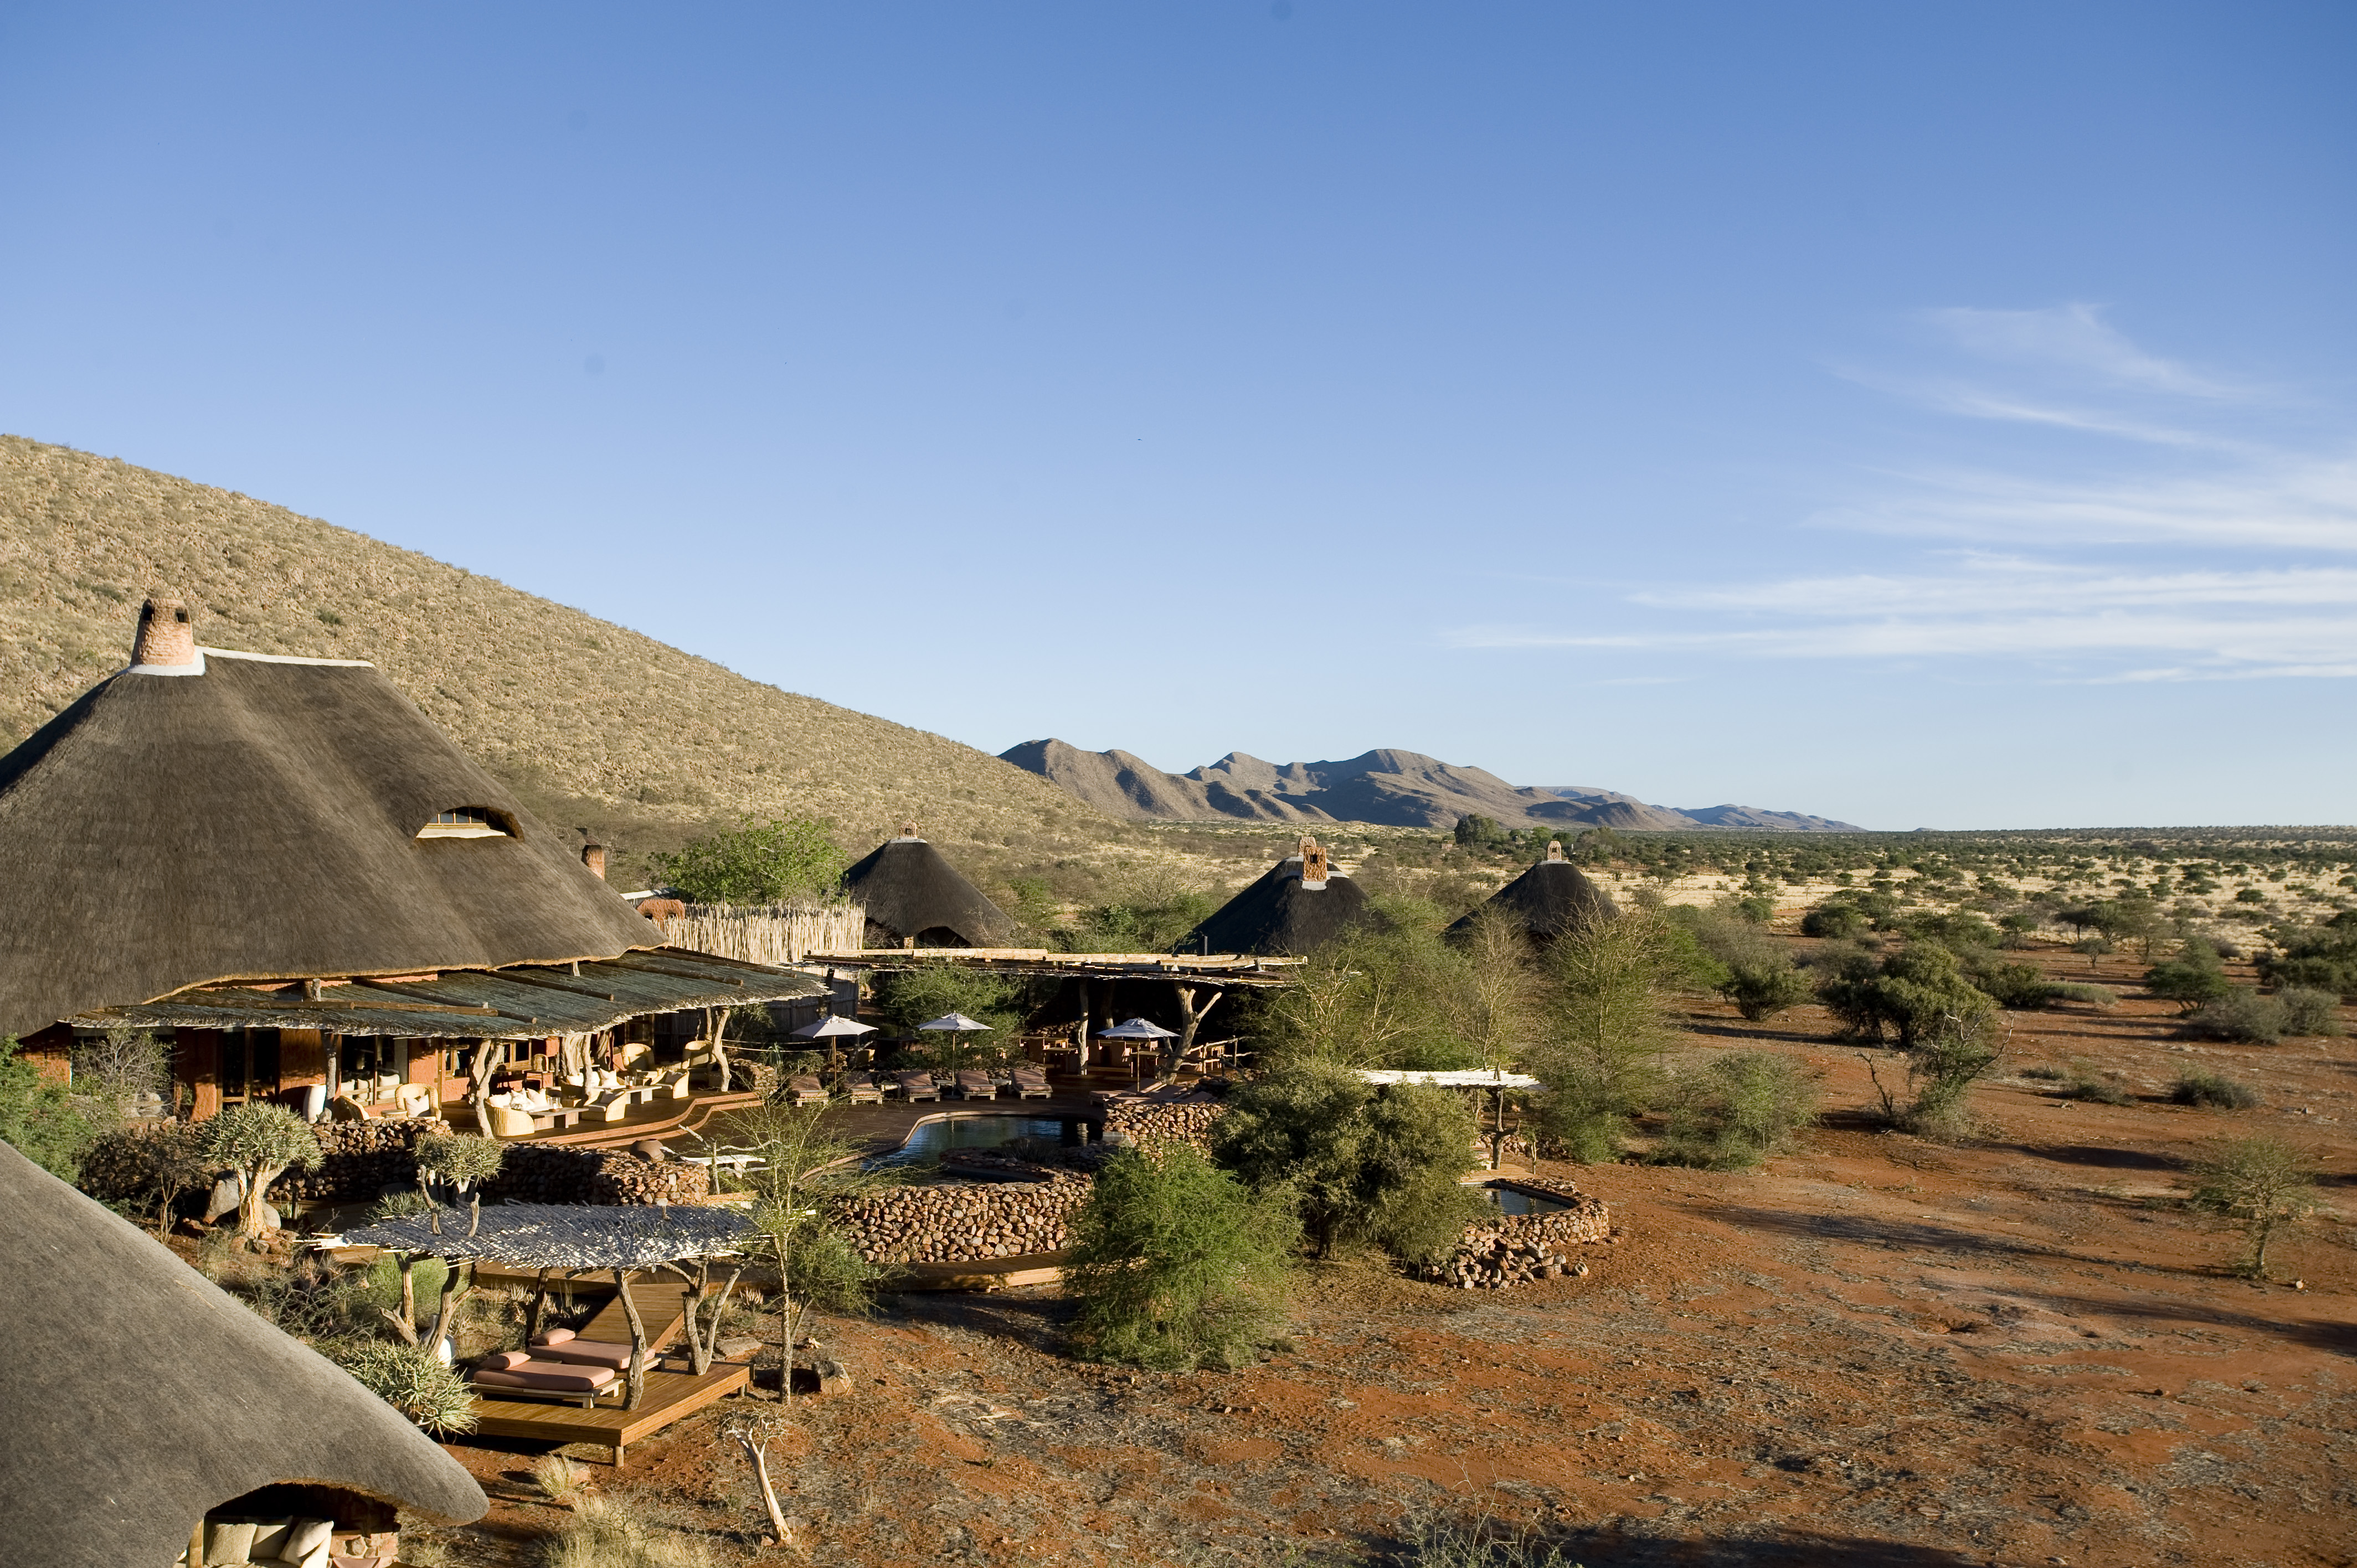 Tswalu - South Africa